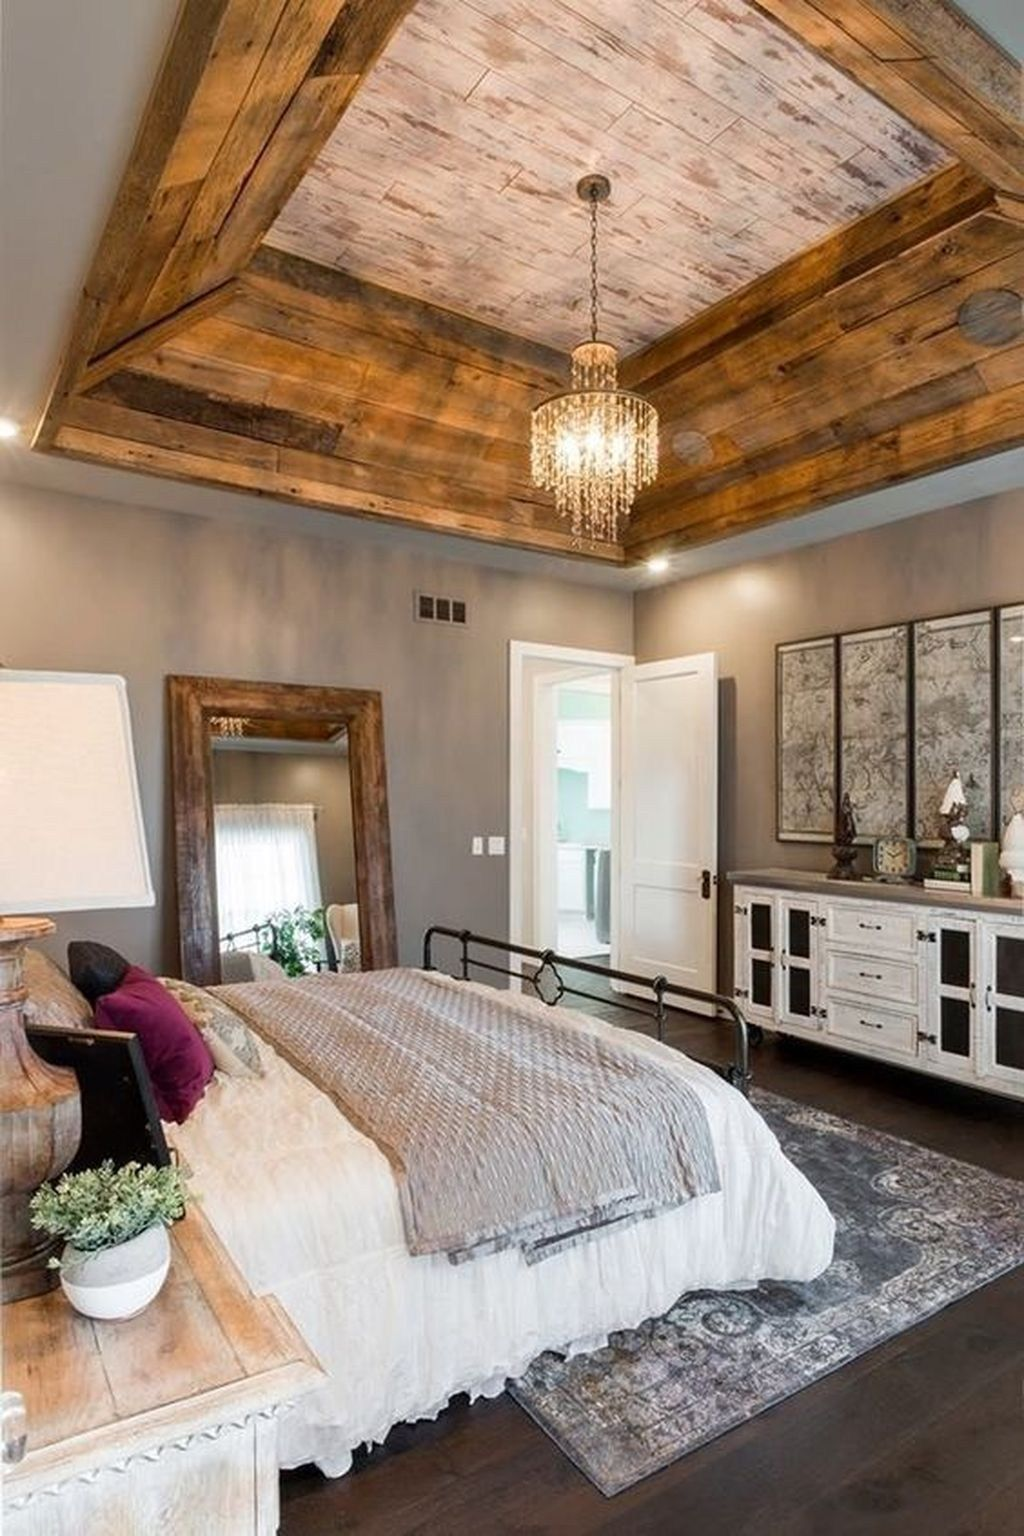 Best 30 Wooden Rustic Furniture Master Bedrooms Ideas 400 x 300